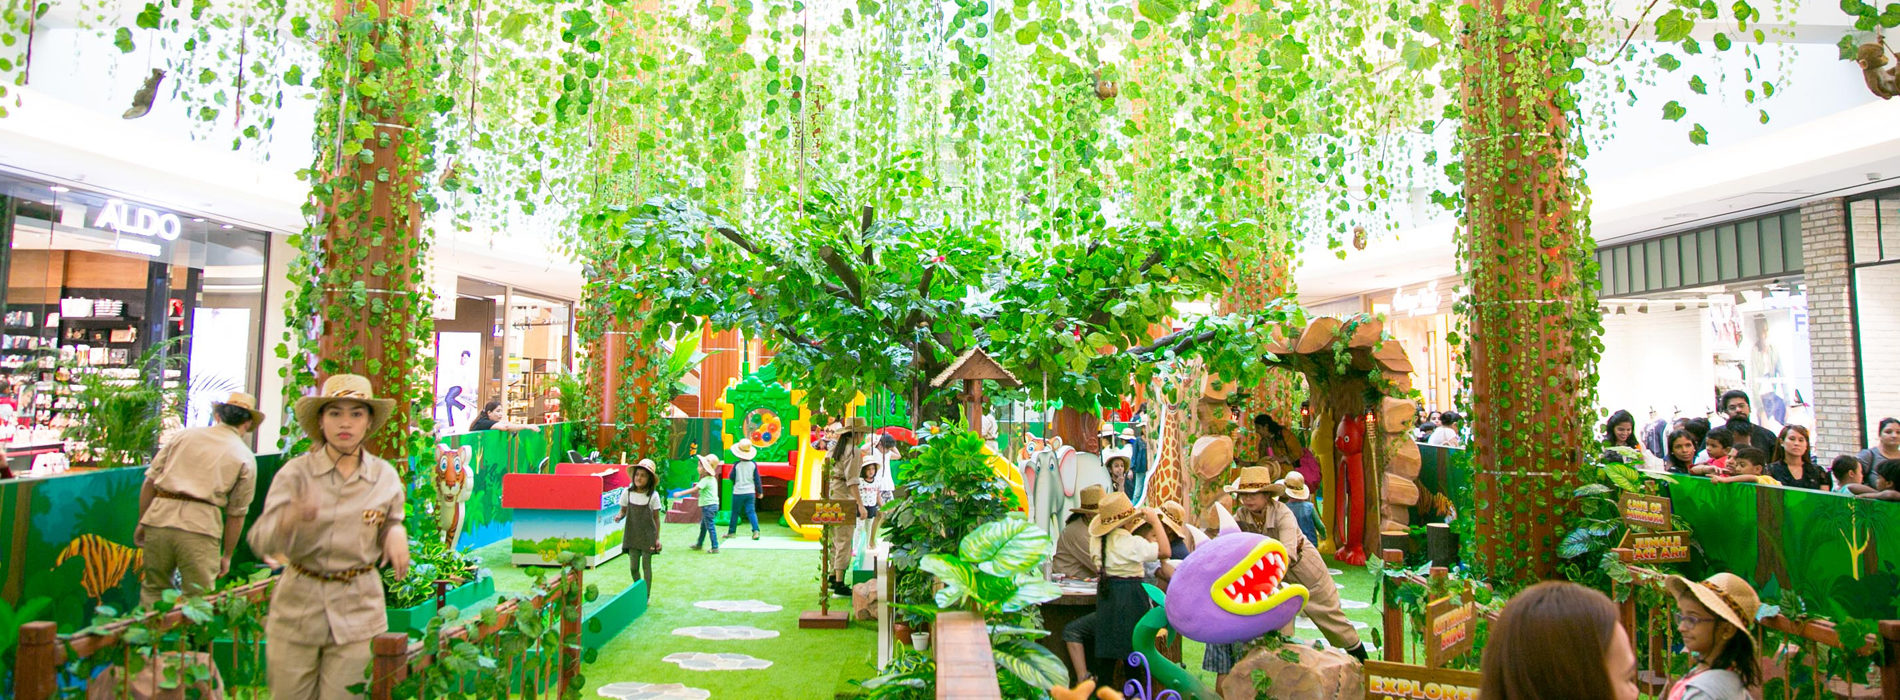 Dubai's BurJuman Mall Jungle Journey adventure is BACK!